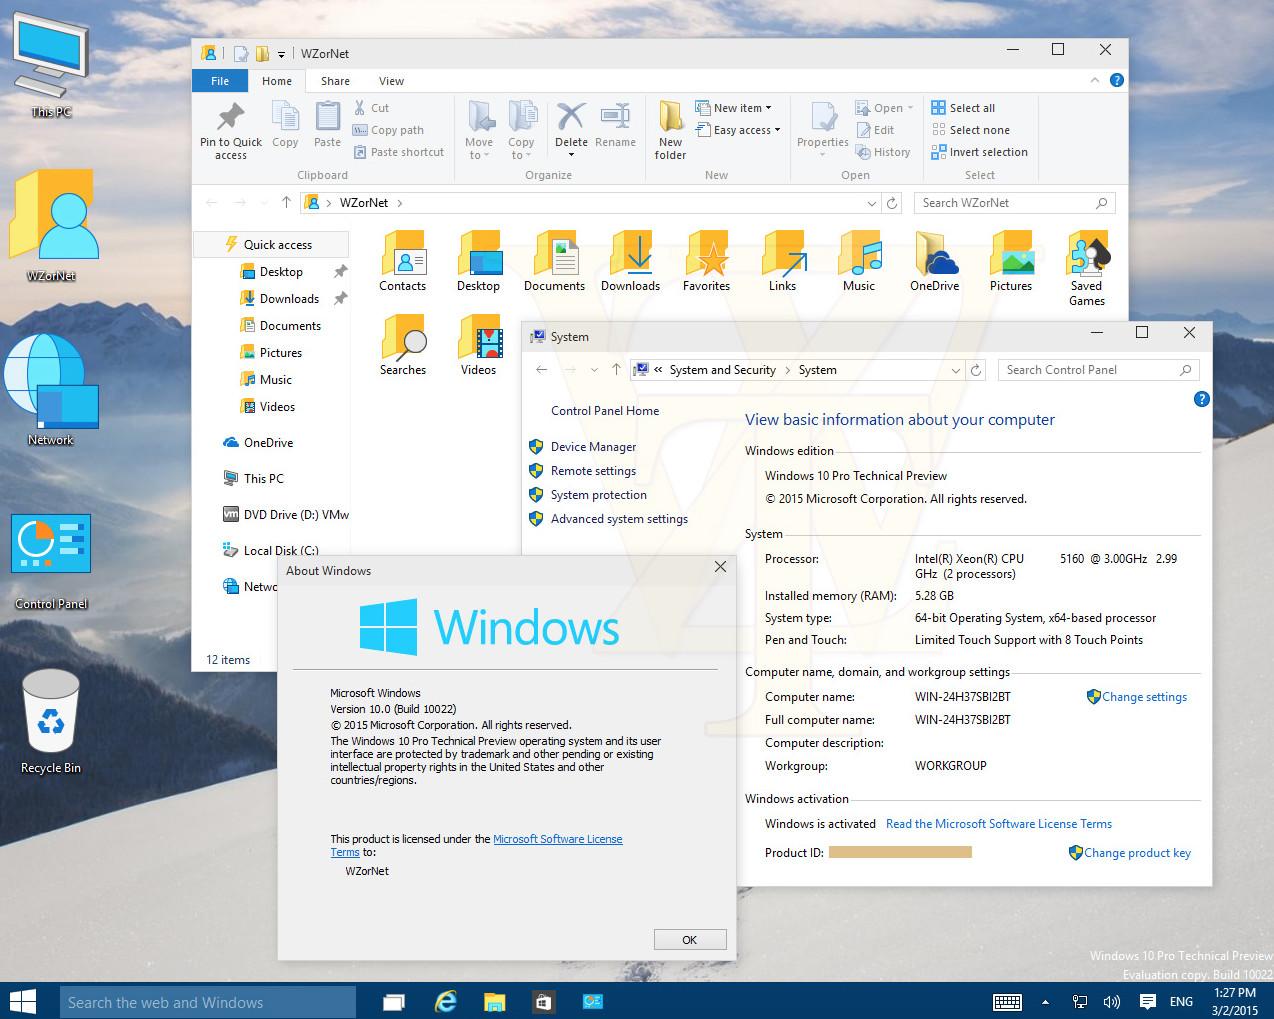 Plethora of screenshots from Windows 10 build 10022 leak